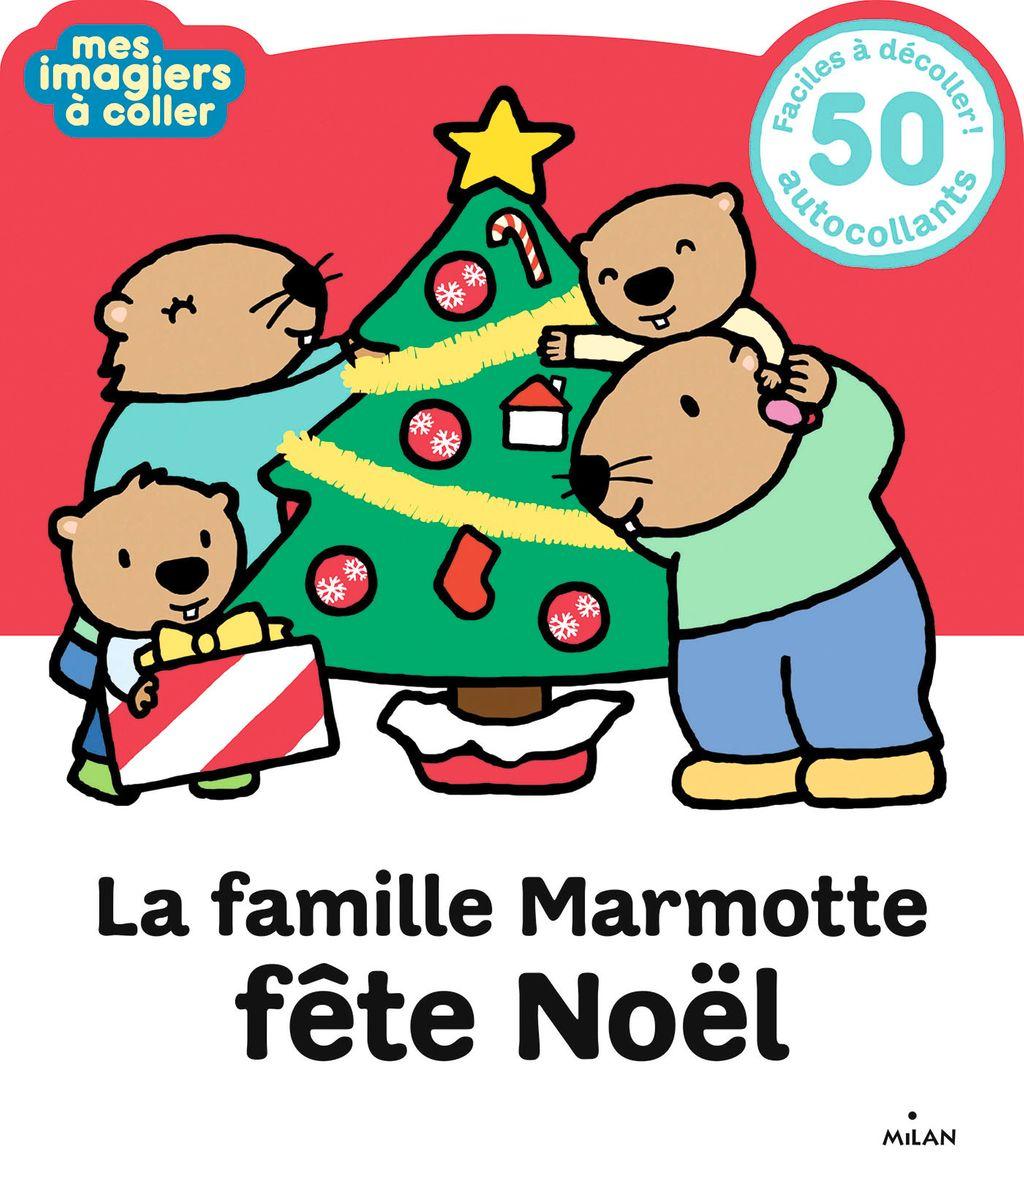 La Famille Marmotte Fete Noel Editions Milan